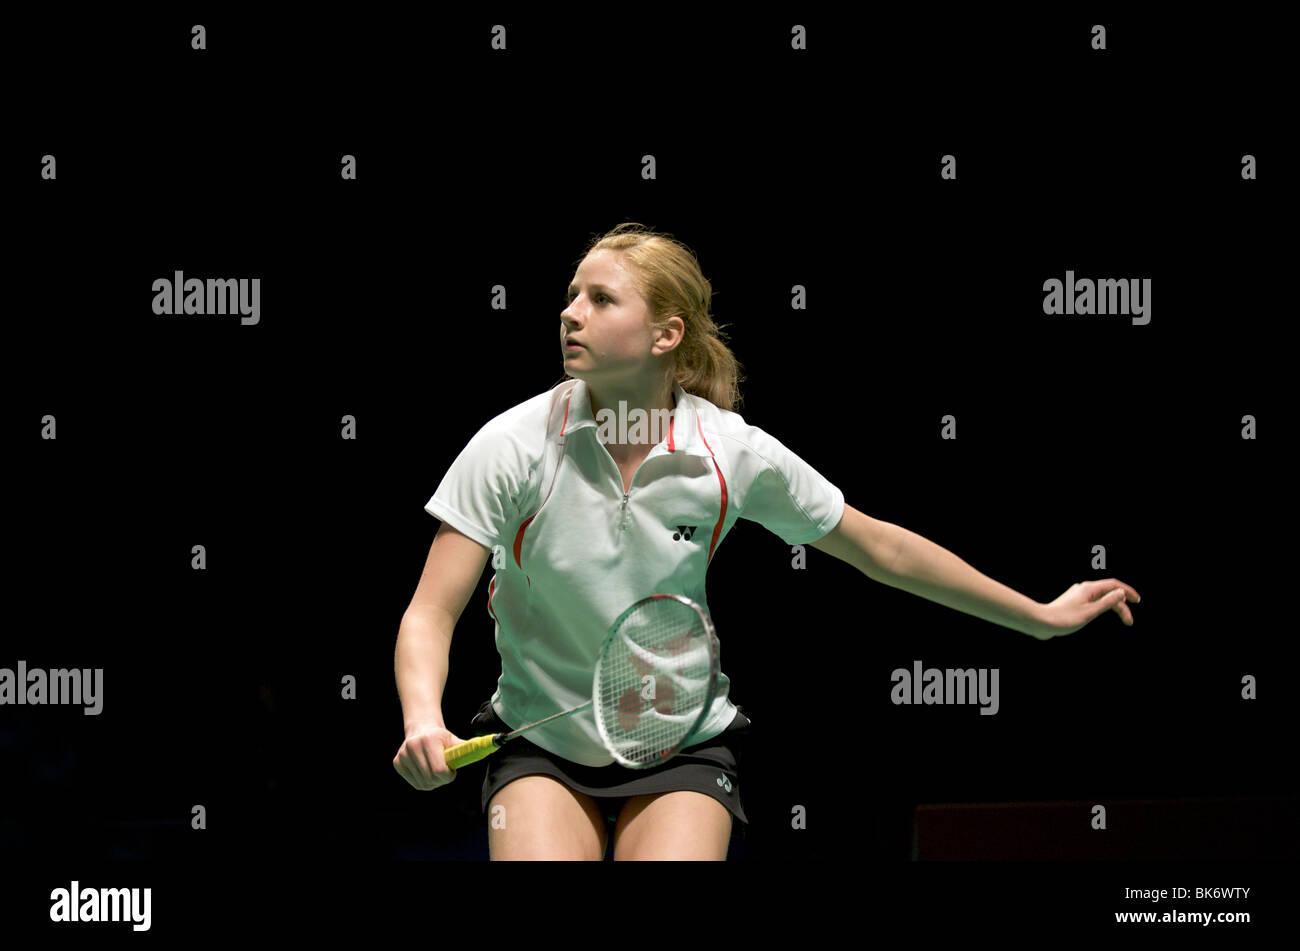 Anna Narel se prepara para recibir a servir en el Campeonato Europeo de bádminton en Mancester 2010 Imagen De Stock